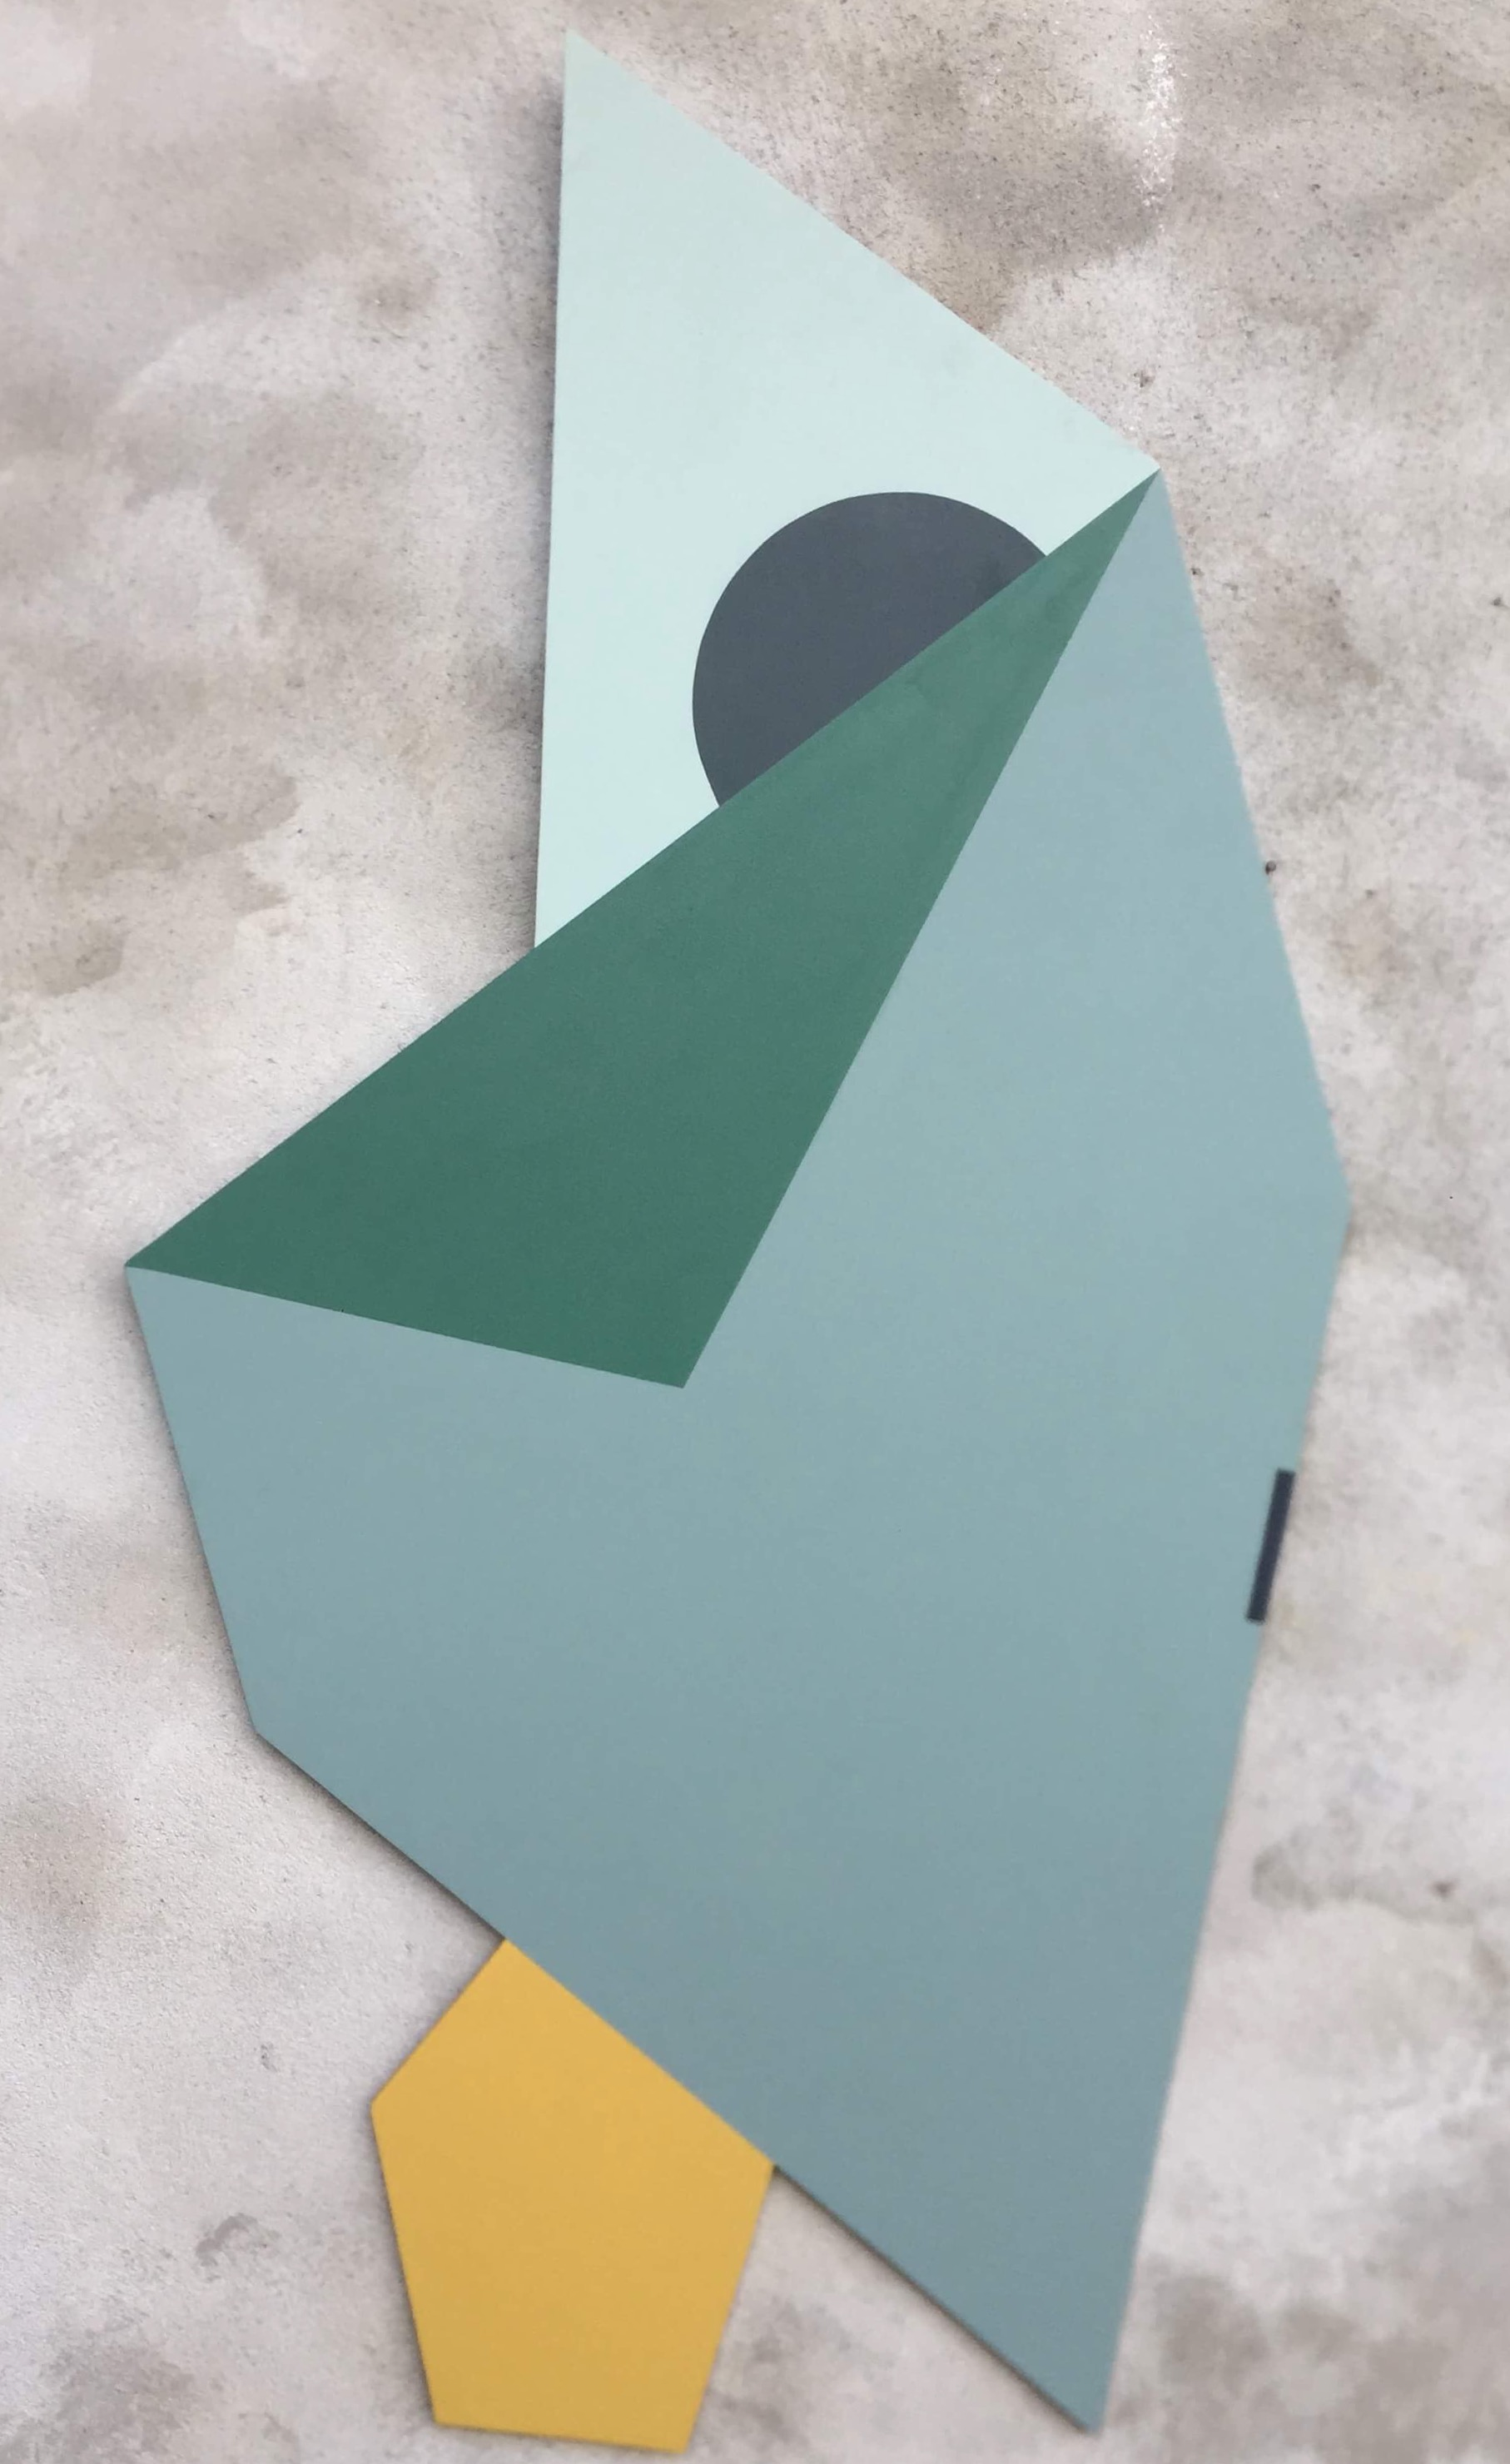 Geometric cut. Acrylic on panel. By Henriette Fabricius